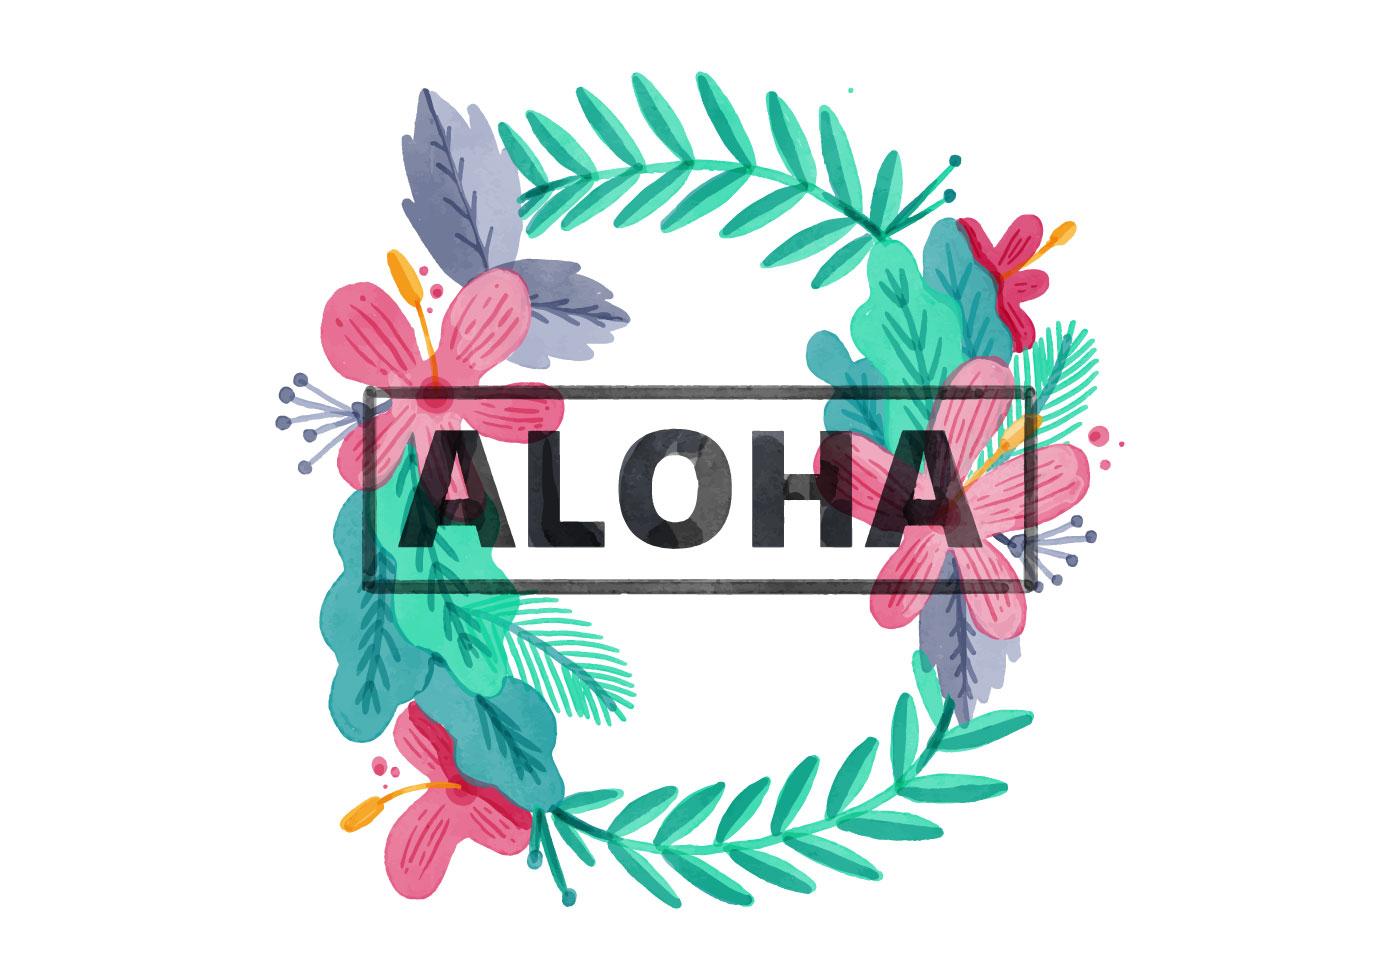 Todd Clipart 20 Fee Cliparts Download Imagenes: Hawaiian Lei Free Vector Art